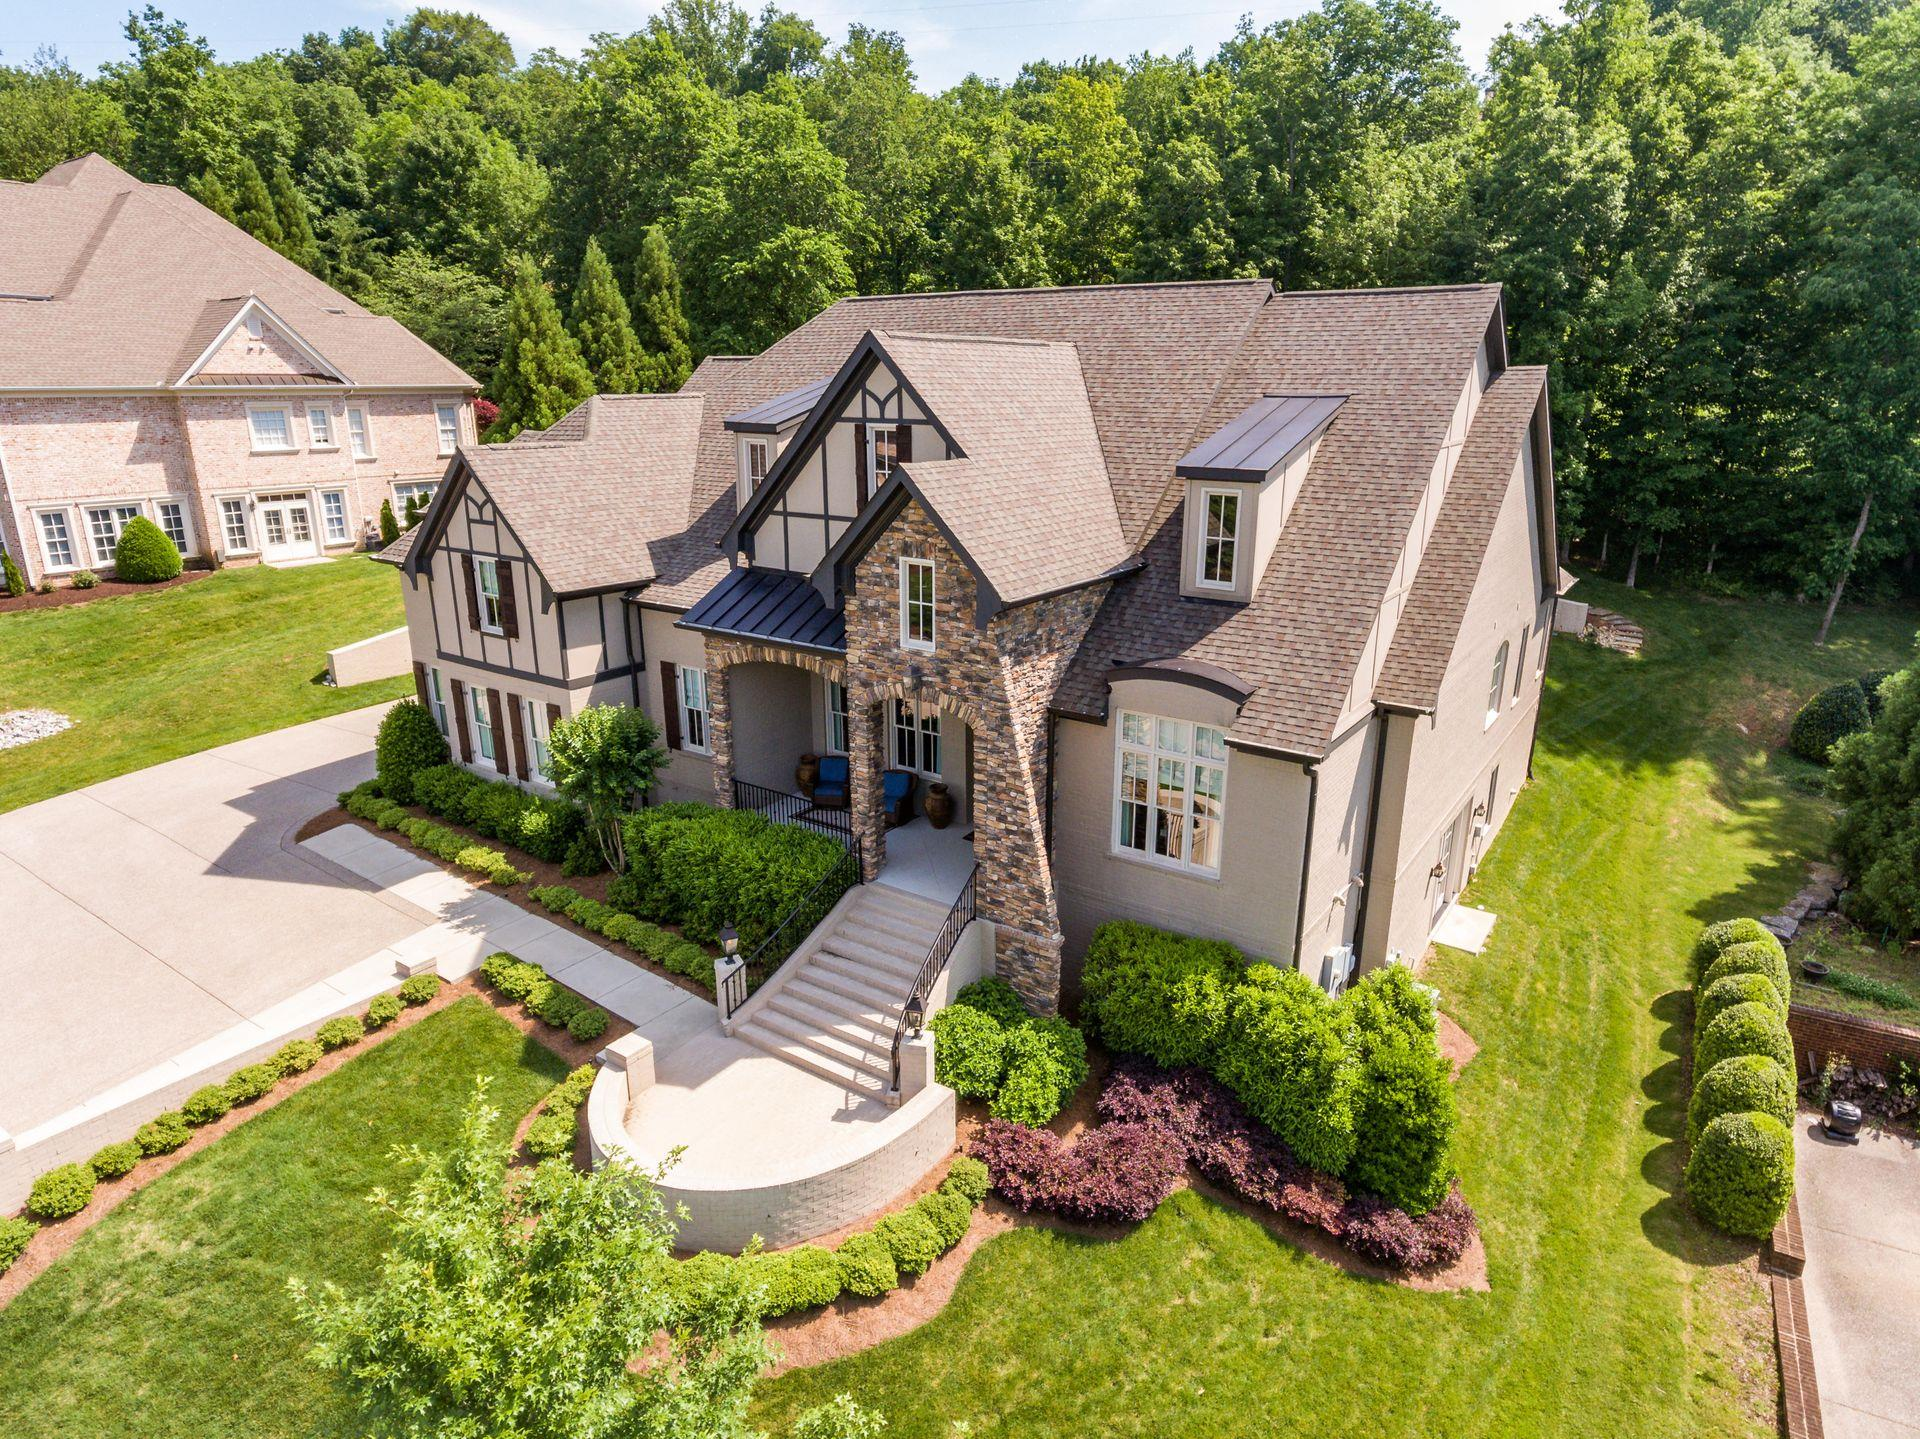 5500 Iron Gate Dr, Franklin, TN 37069 - Franklin, TN real estate listing